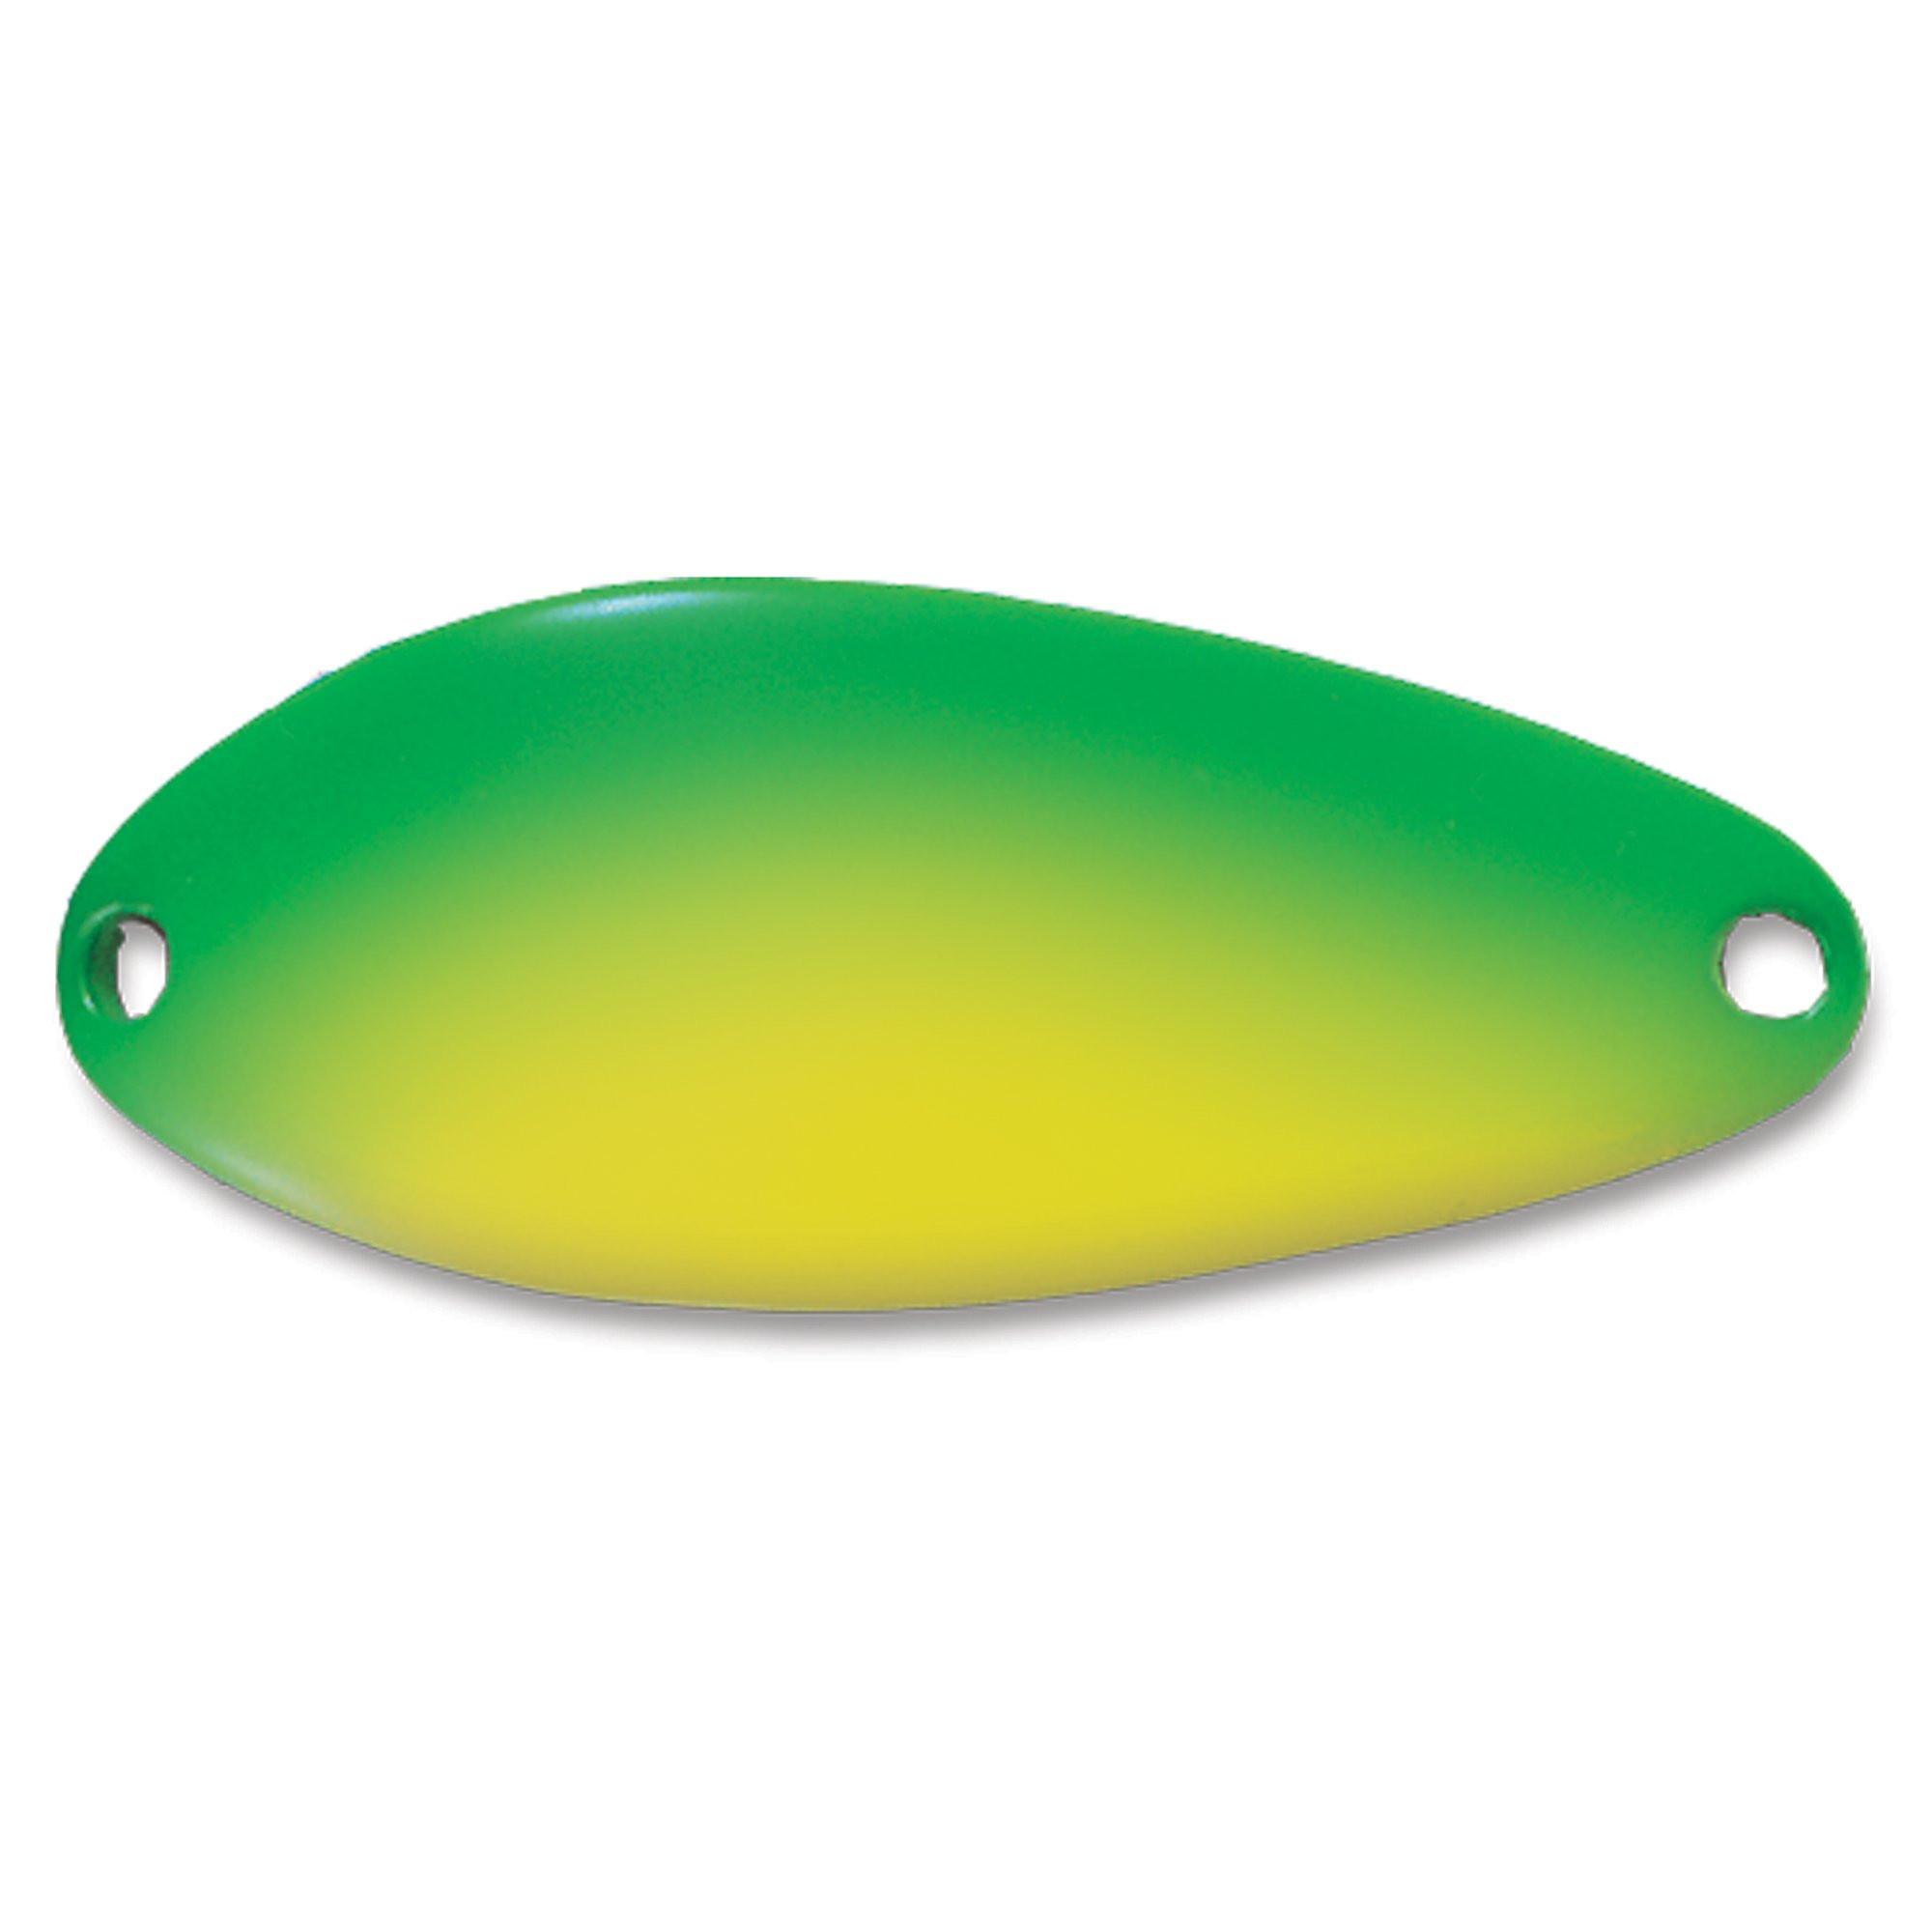 Acme Little Cleo C-100 1/3oz Green/Yellow